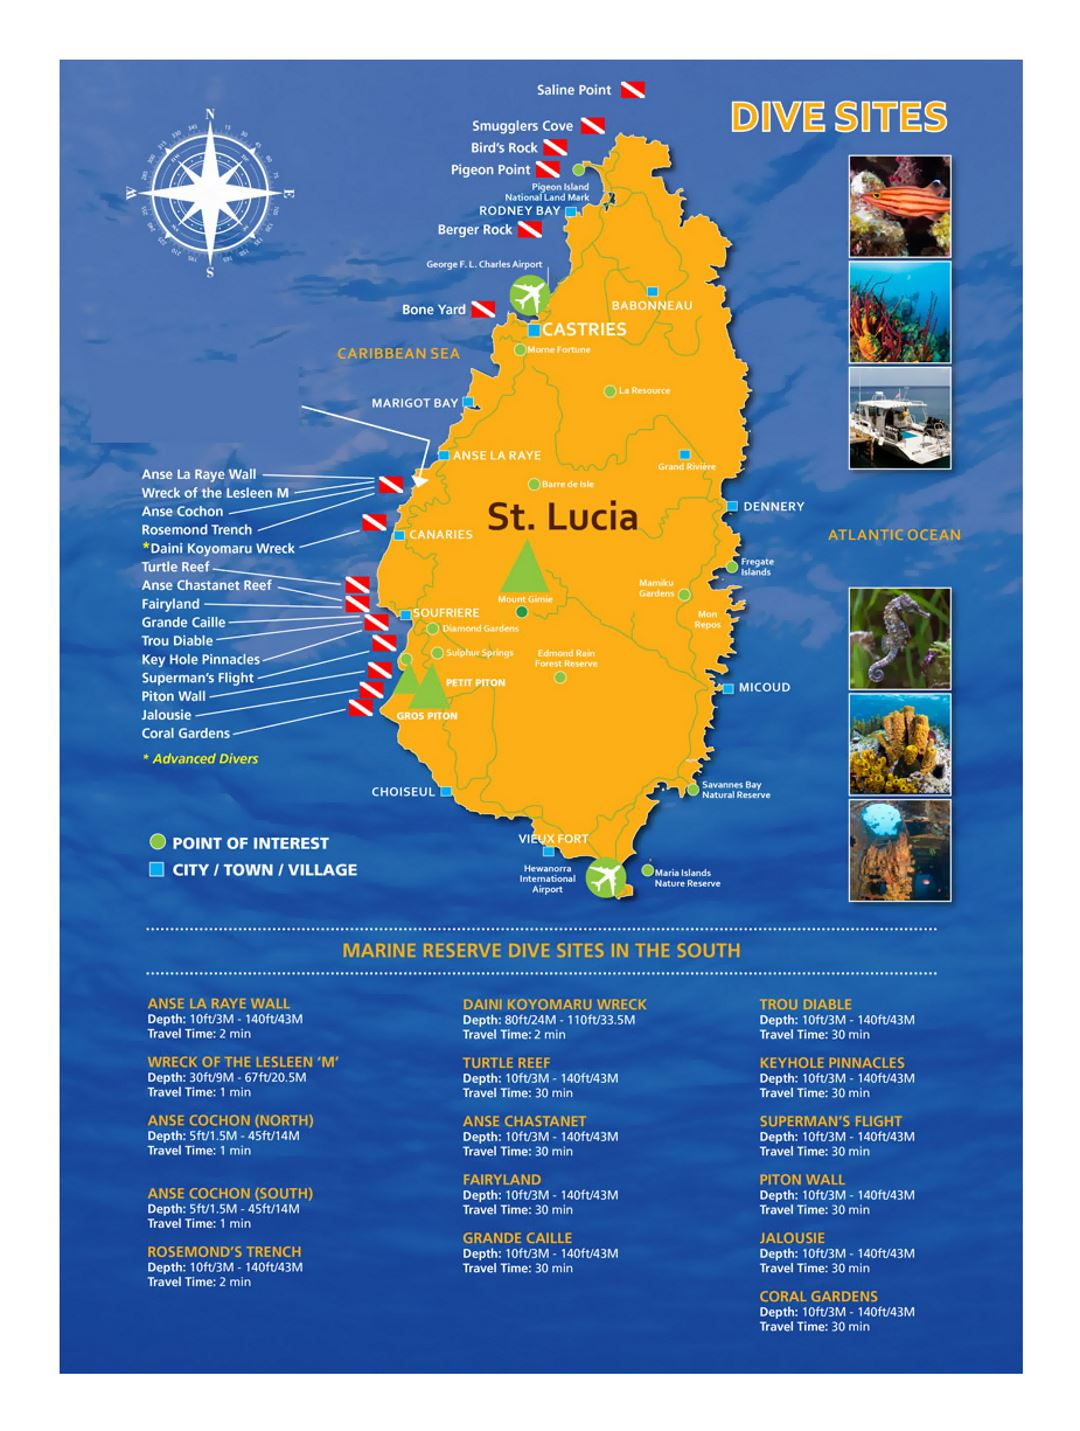 Large dive sites map of Saint Lucia Saint Lucia North America